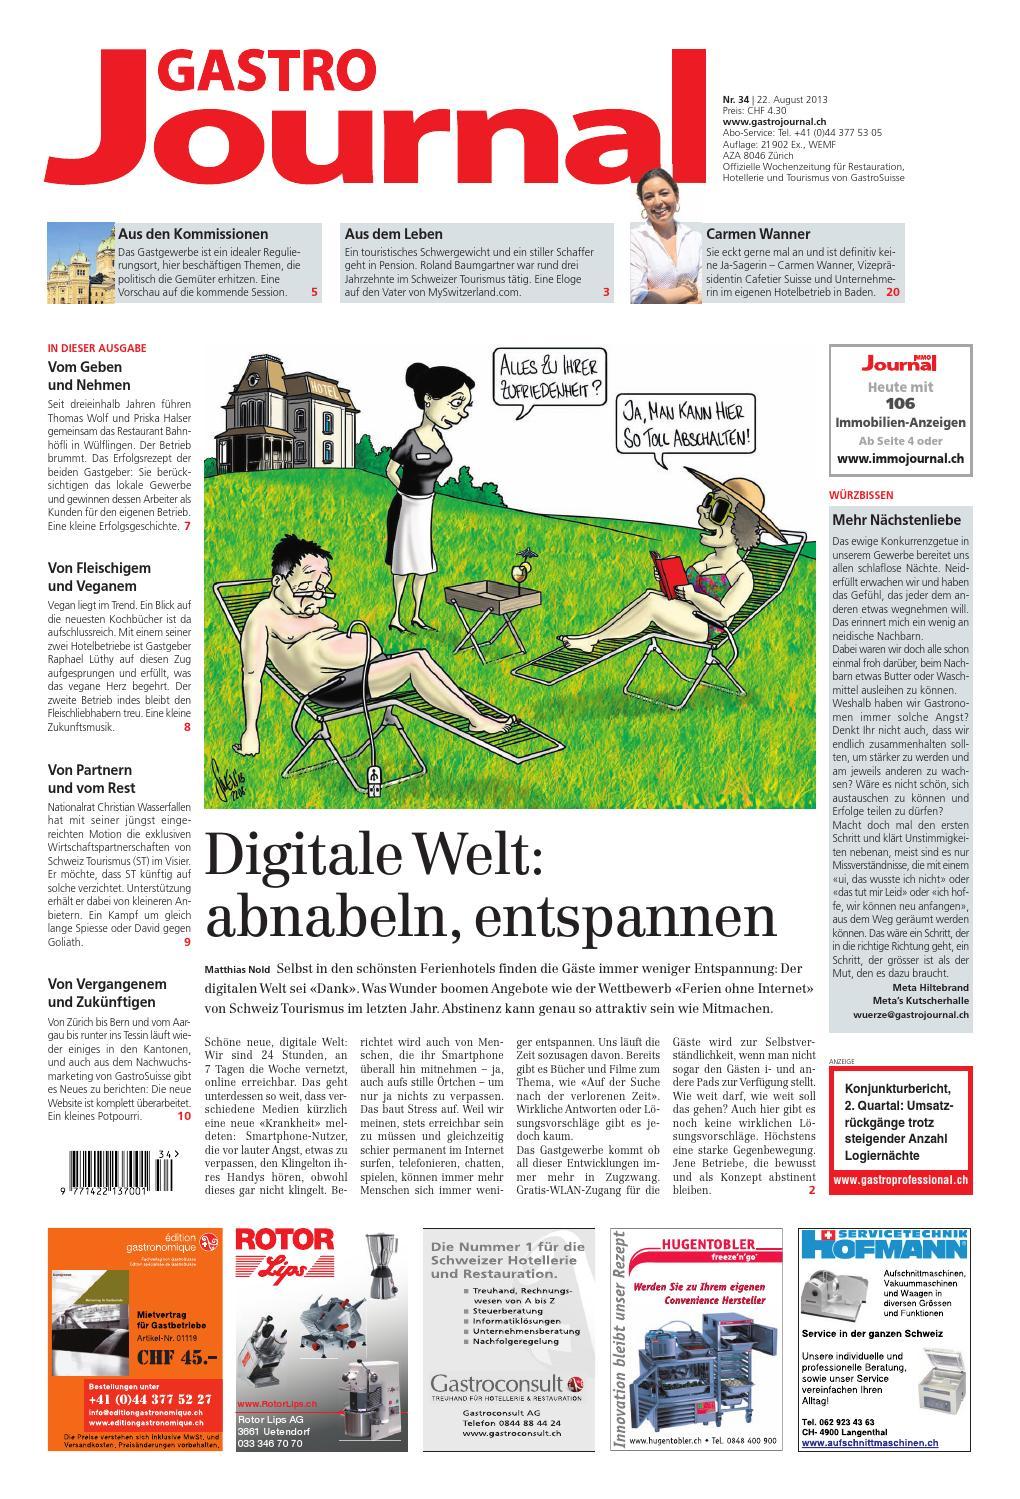 Internet-Art-Gallery Andreas Tschannen / Oelbilder Aktbilder